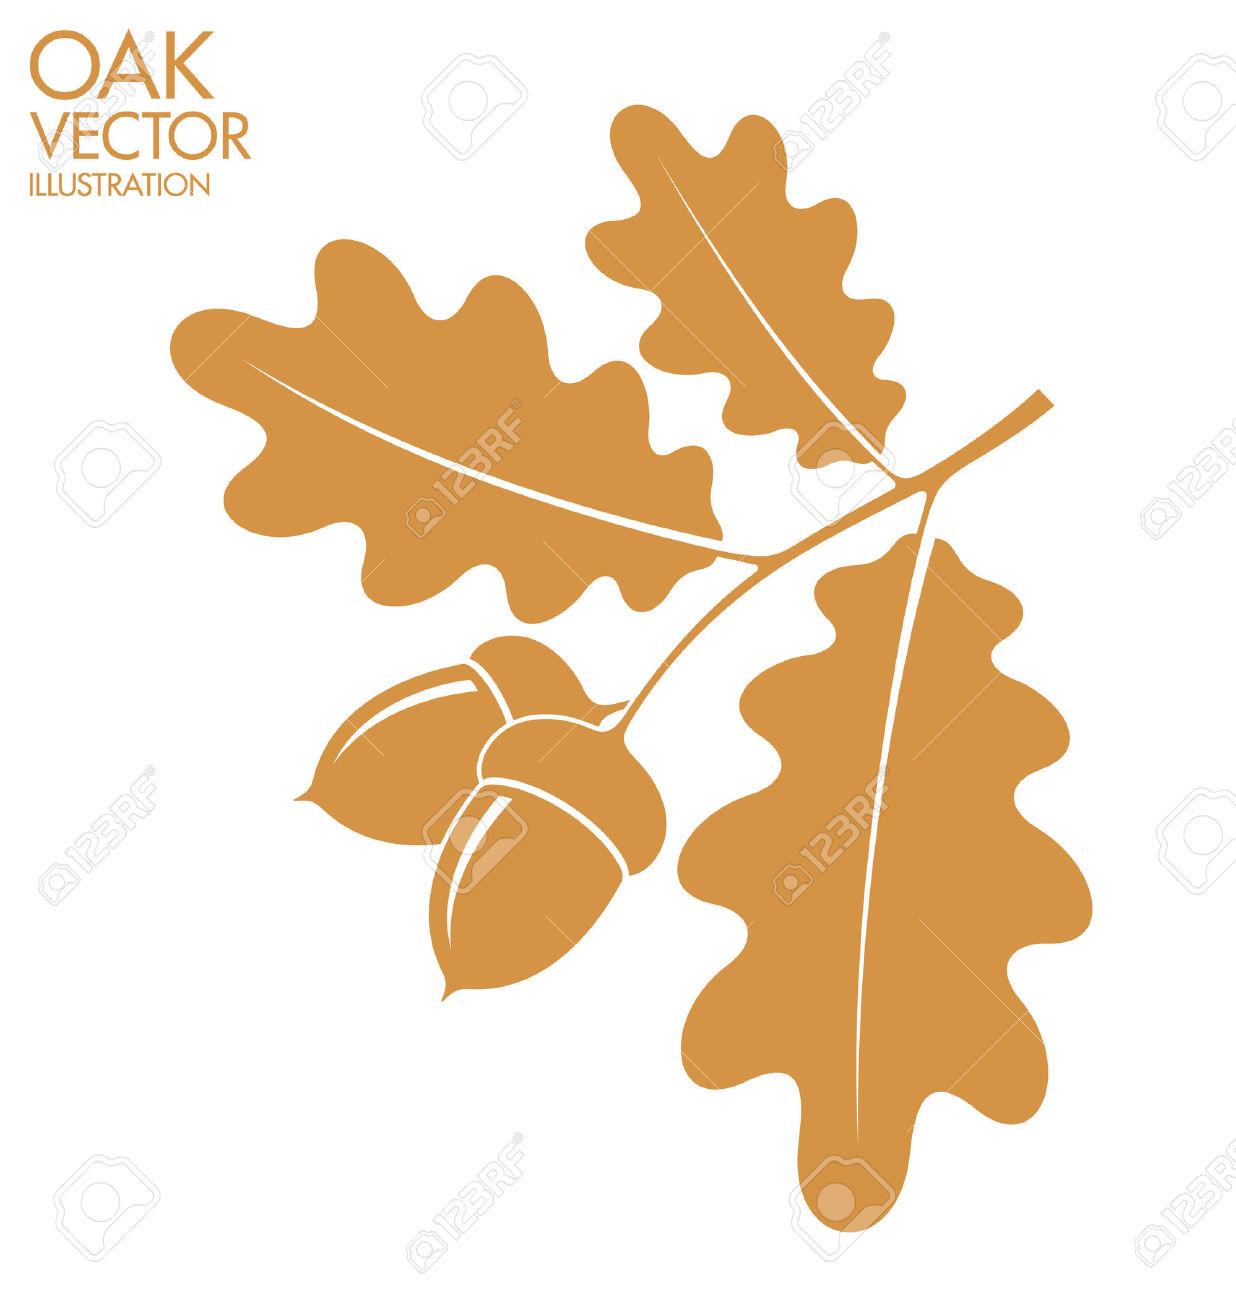 Acorn clipart oak leave. Leaves and acorns station